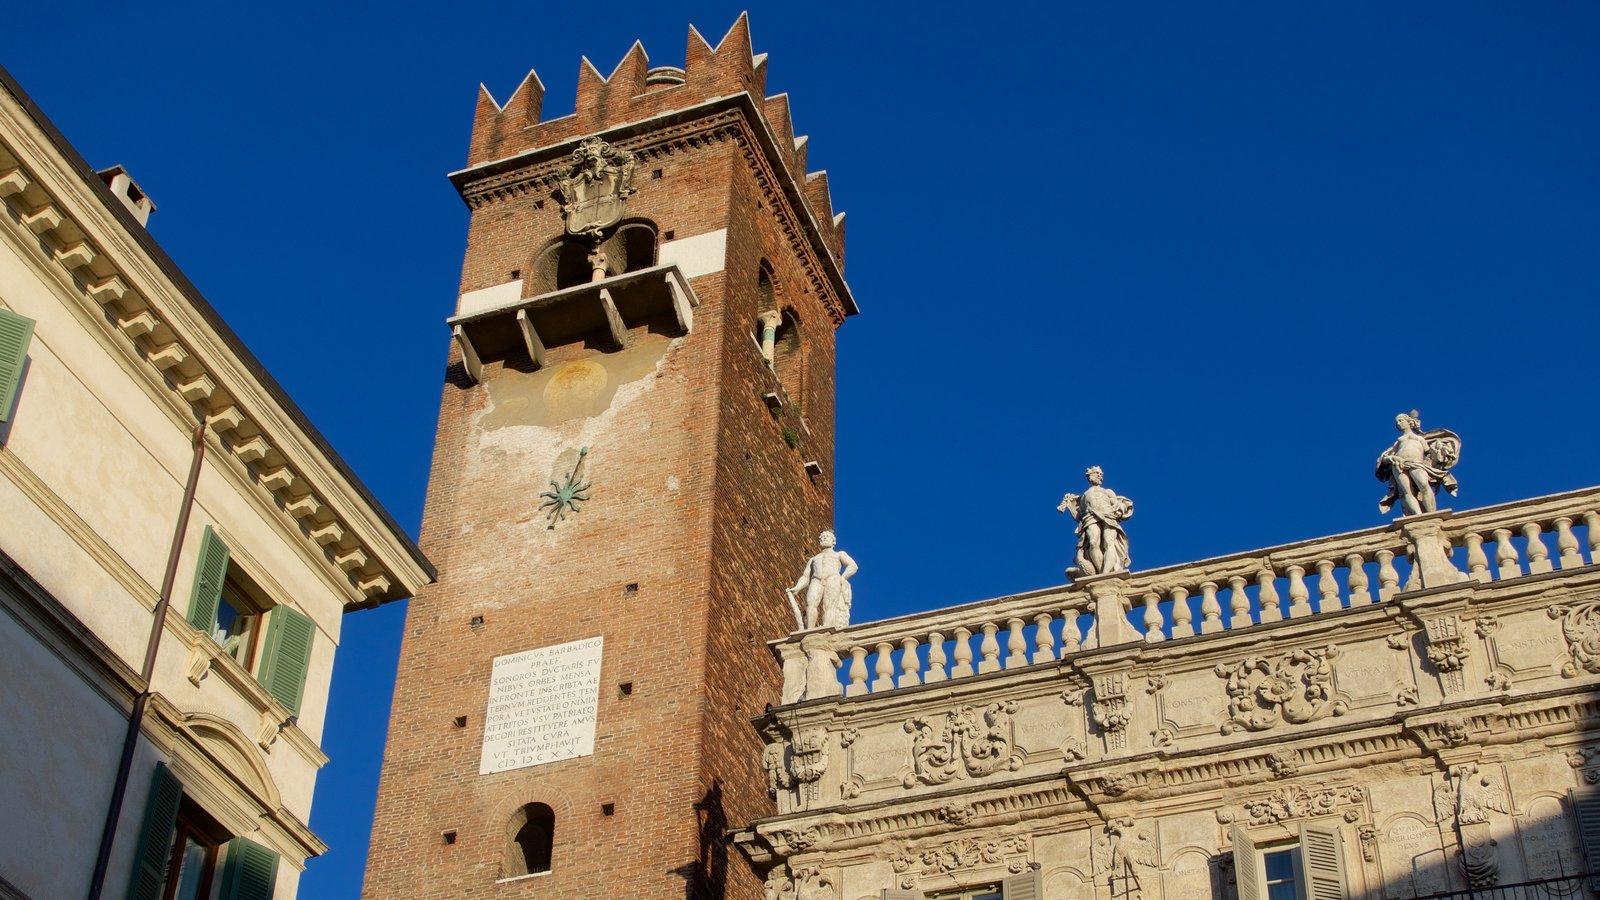 Verona showing heritage architecture